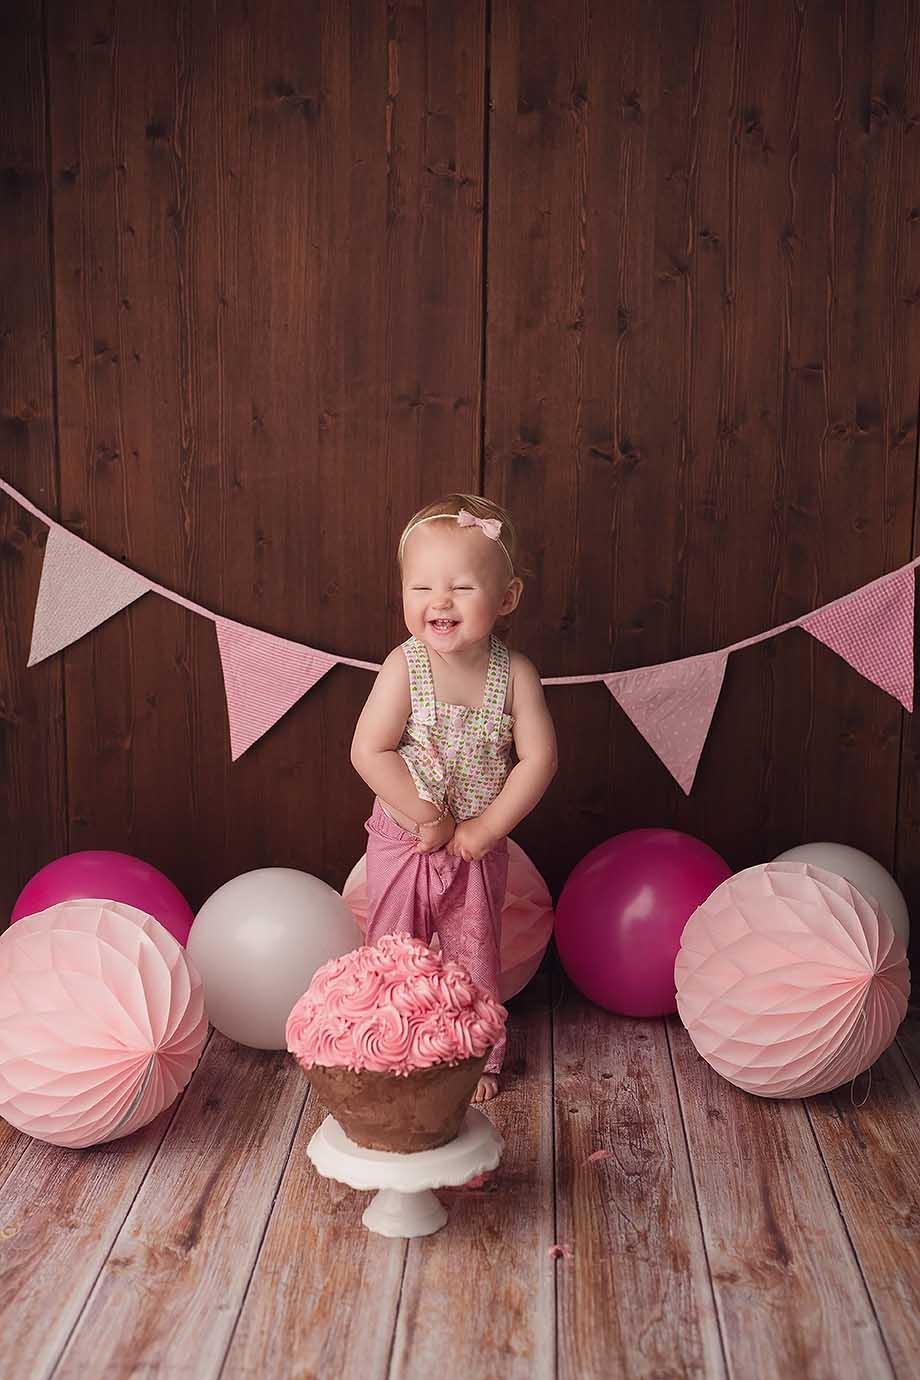 cakesmash-nidda-giessen-frankfurt-exklusive-fotografie-fotograf-geburtstagsshooting-baby-party